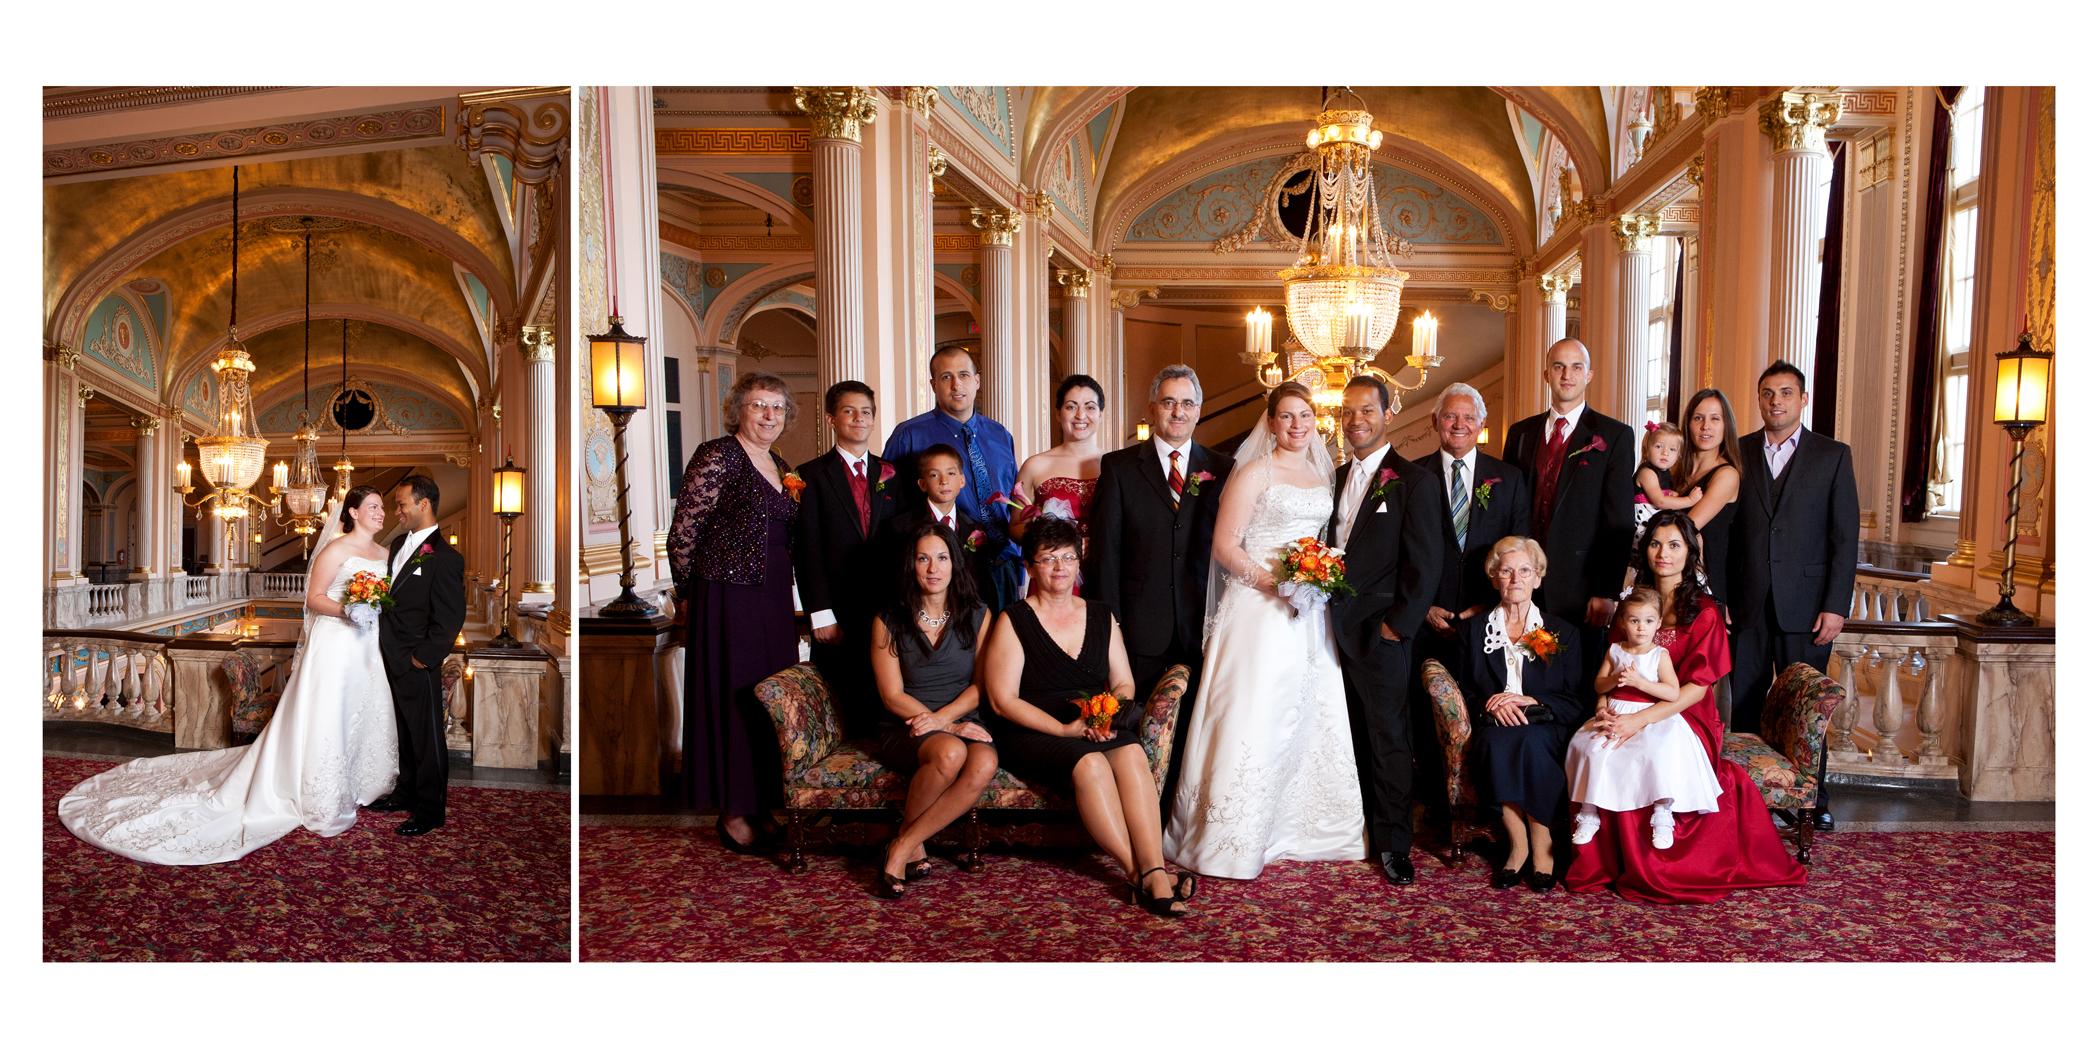 Wedding-Photography-Palaise-Royale-South-Bend-Indiana_26.jpg